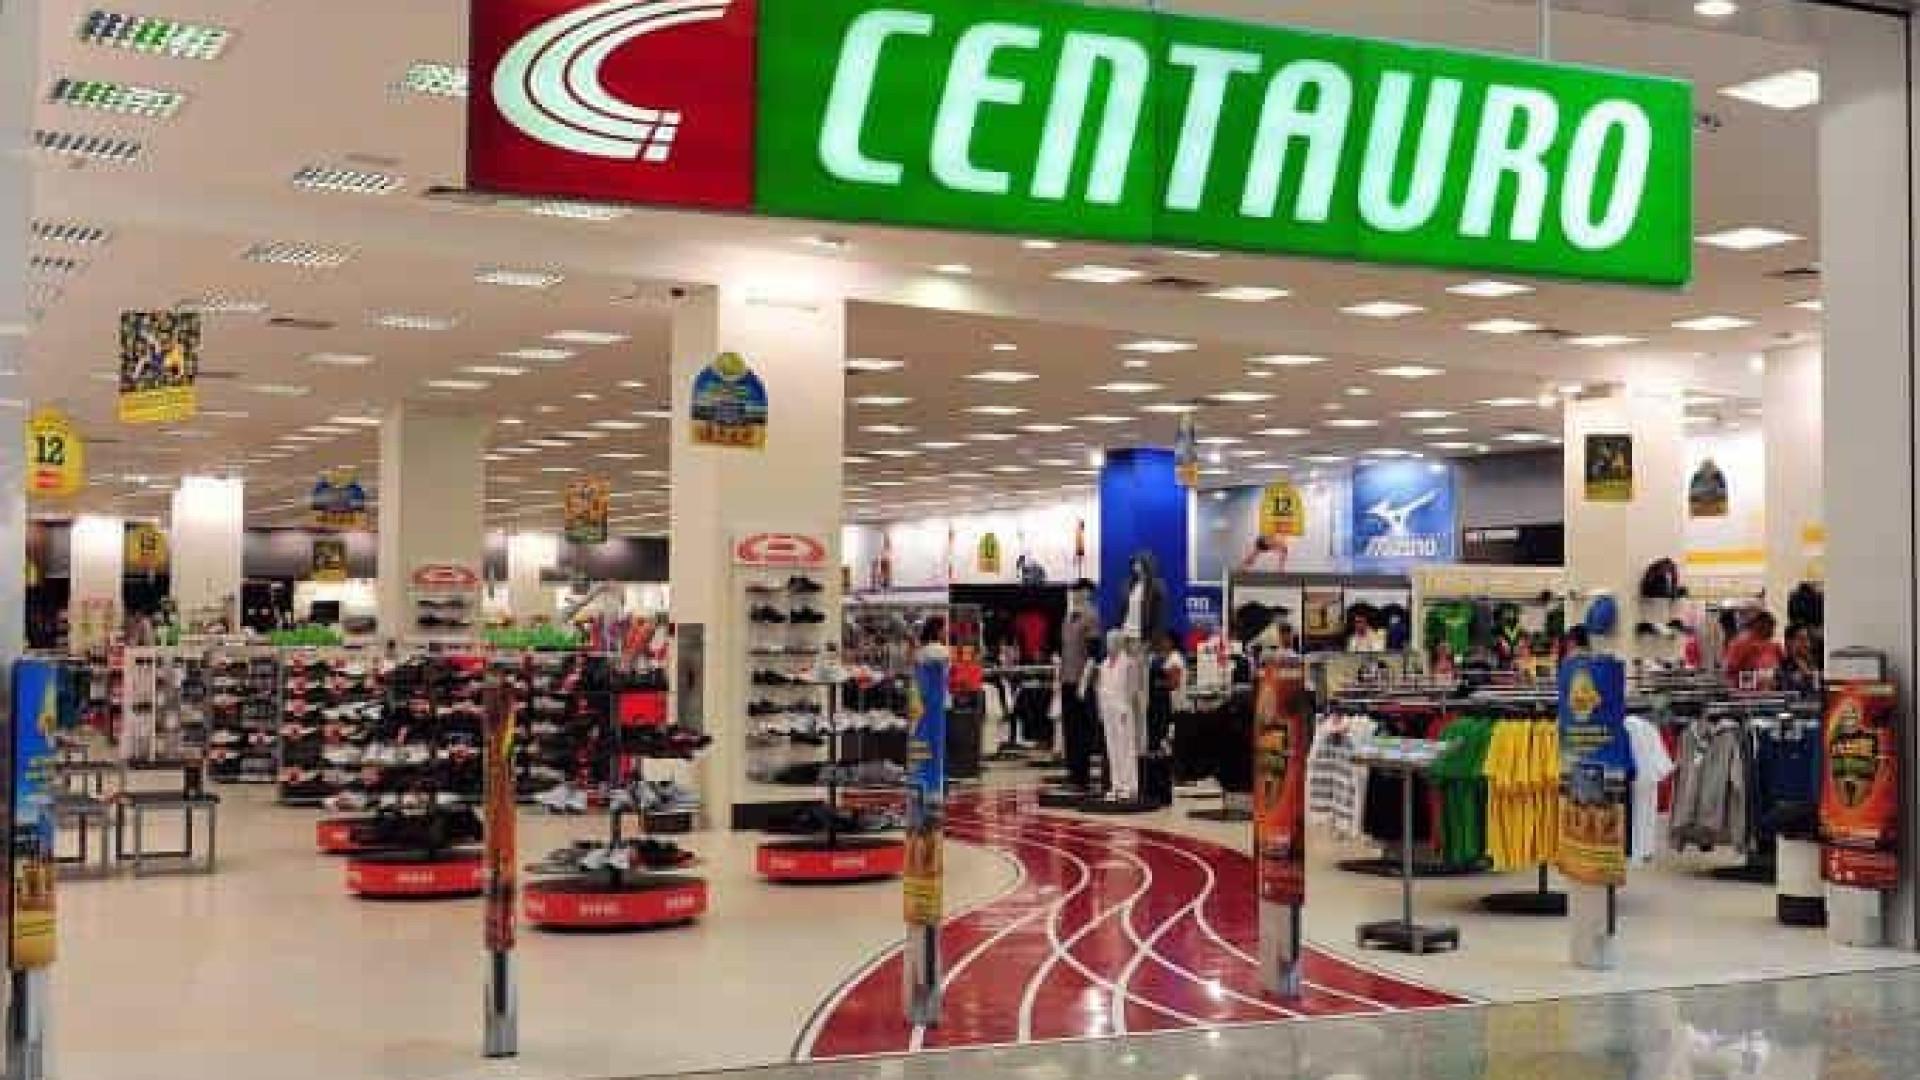 Centauro compra Nike no Brasil por R$ 900 milhões